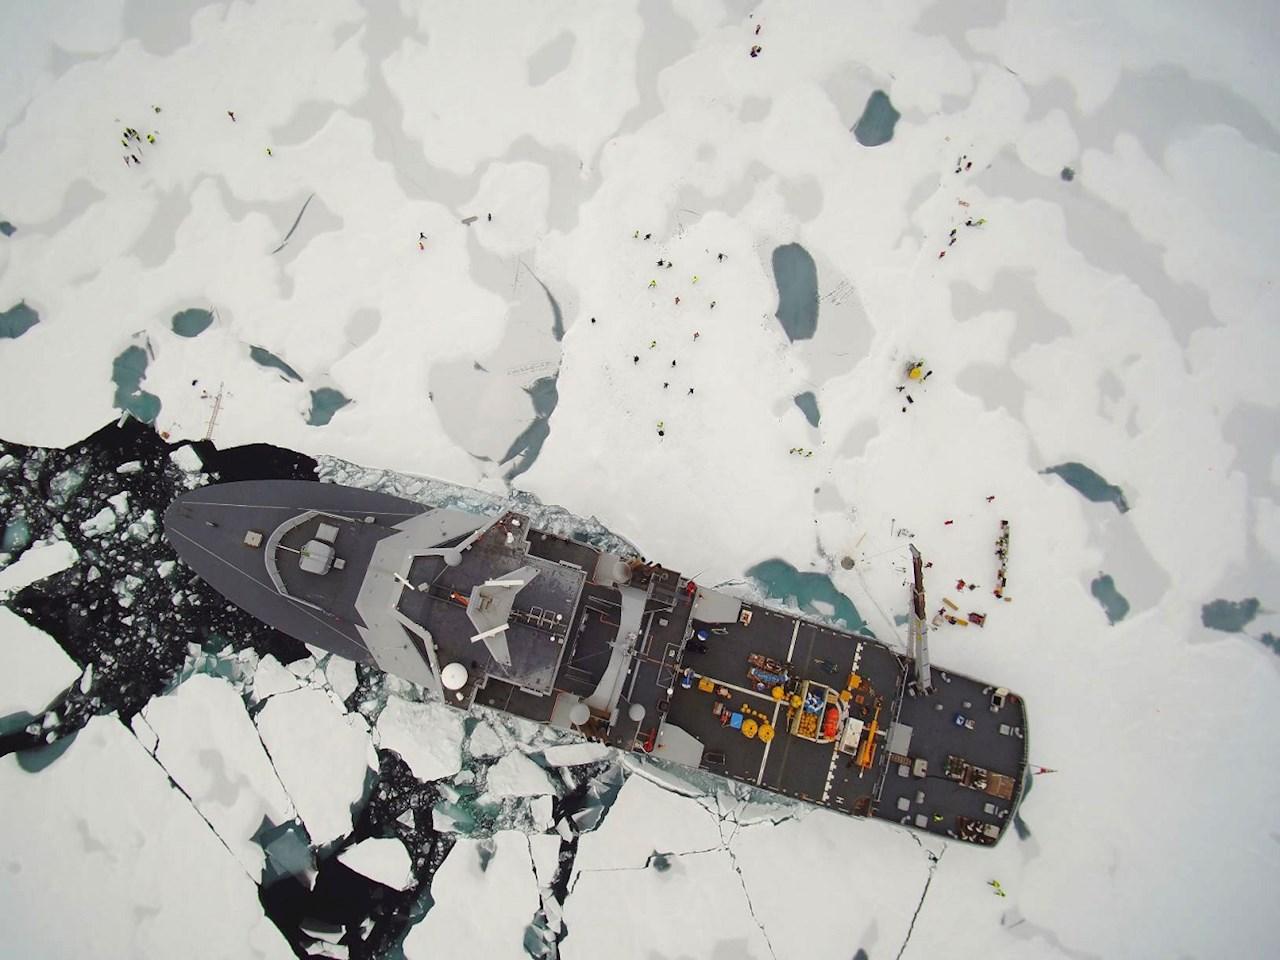 KV Svalbard at the North Pole. Photo courtesy of the Norwegian Coast Guard.